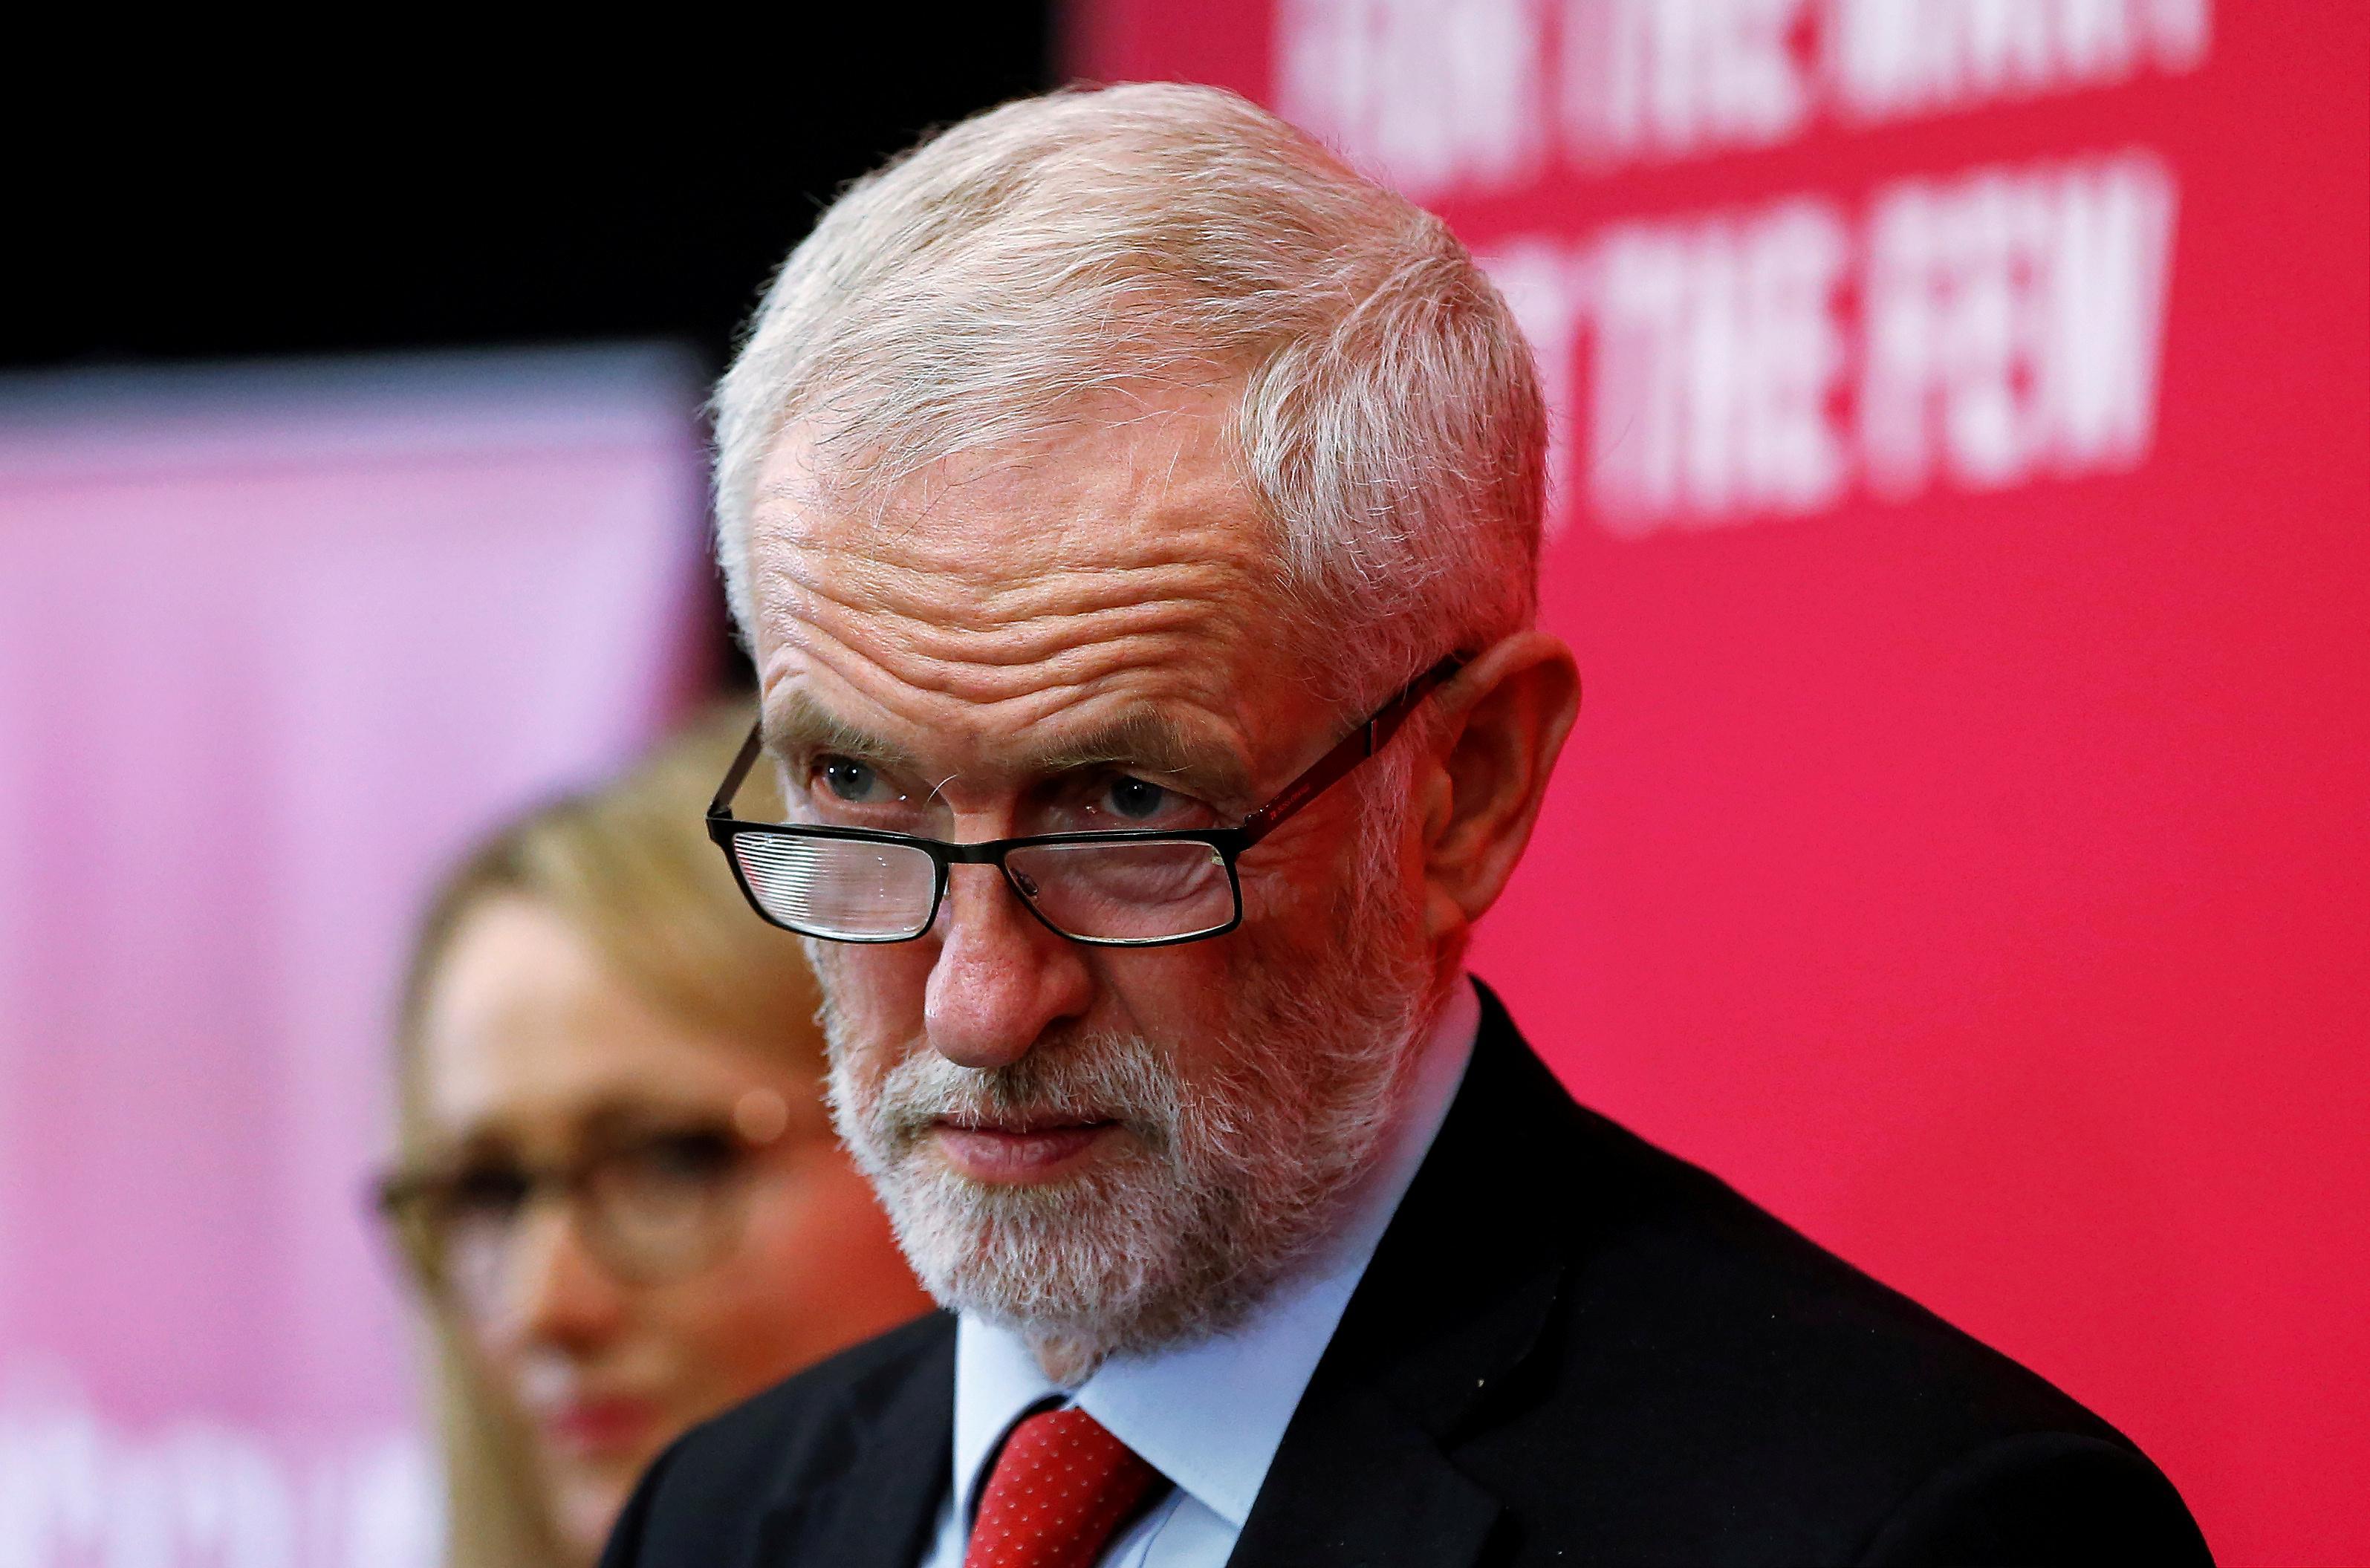 Ready for change? Britain's Labour unveils 'radical' manifesto